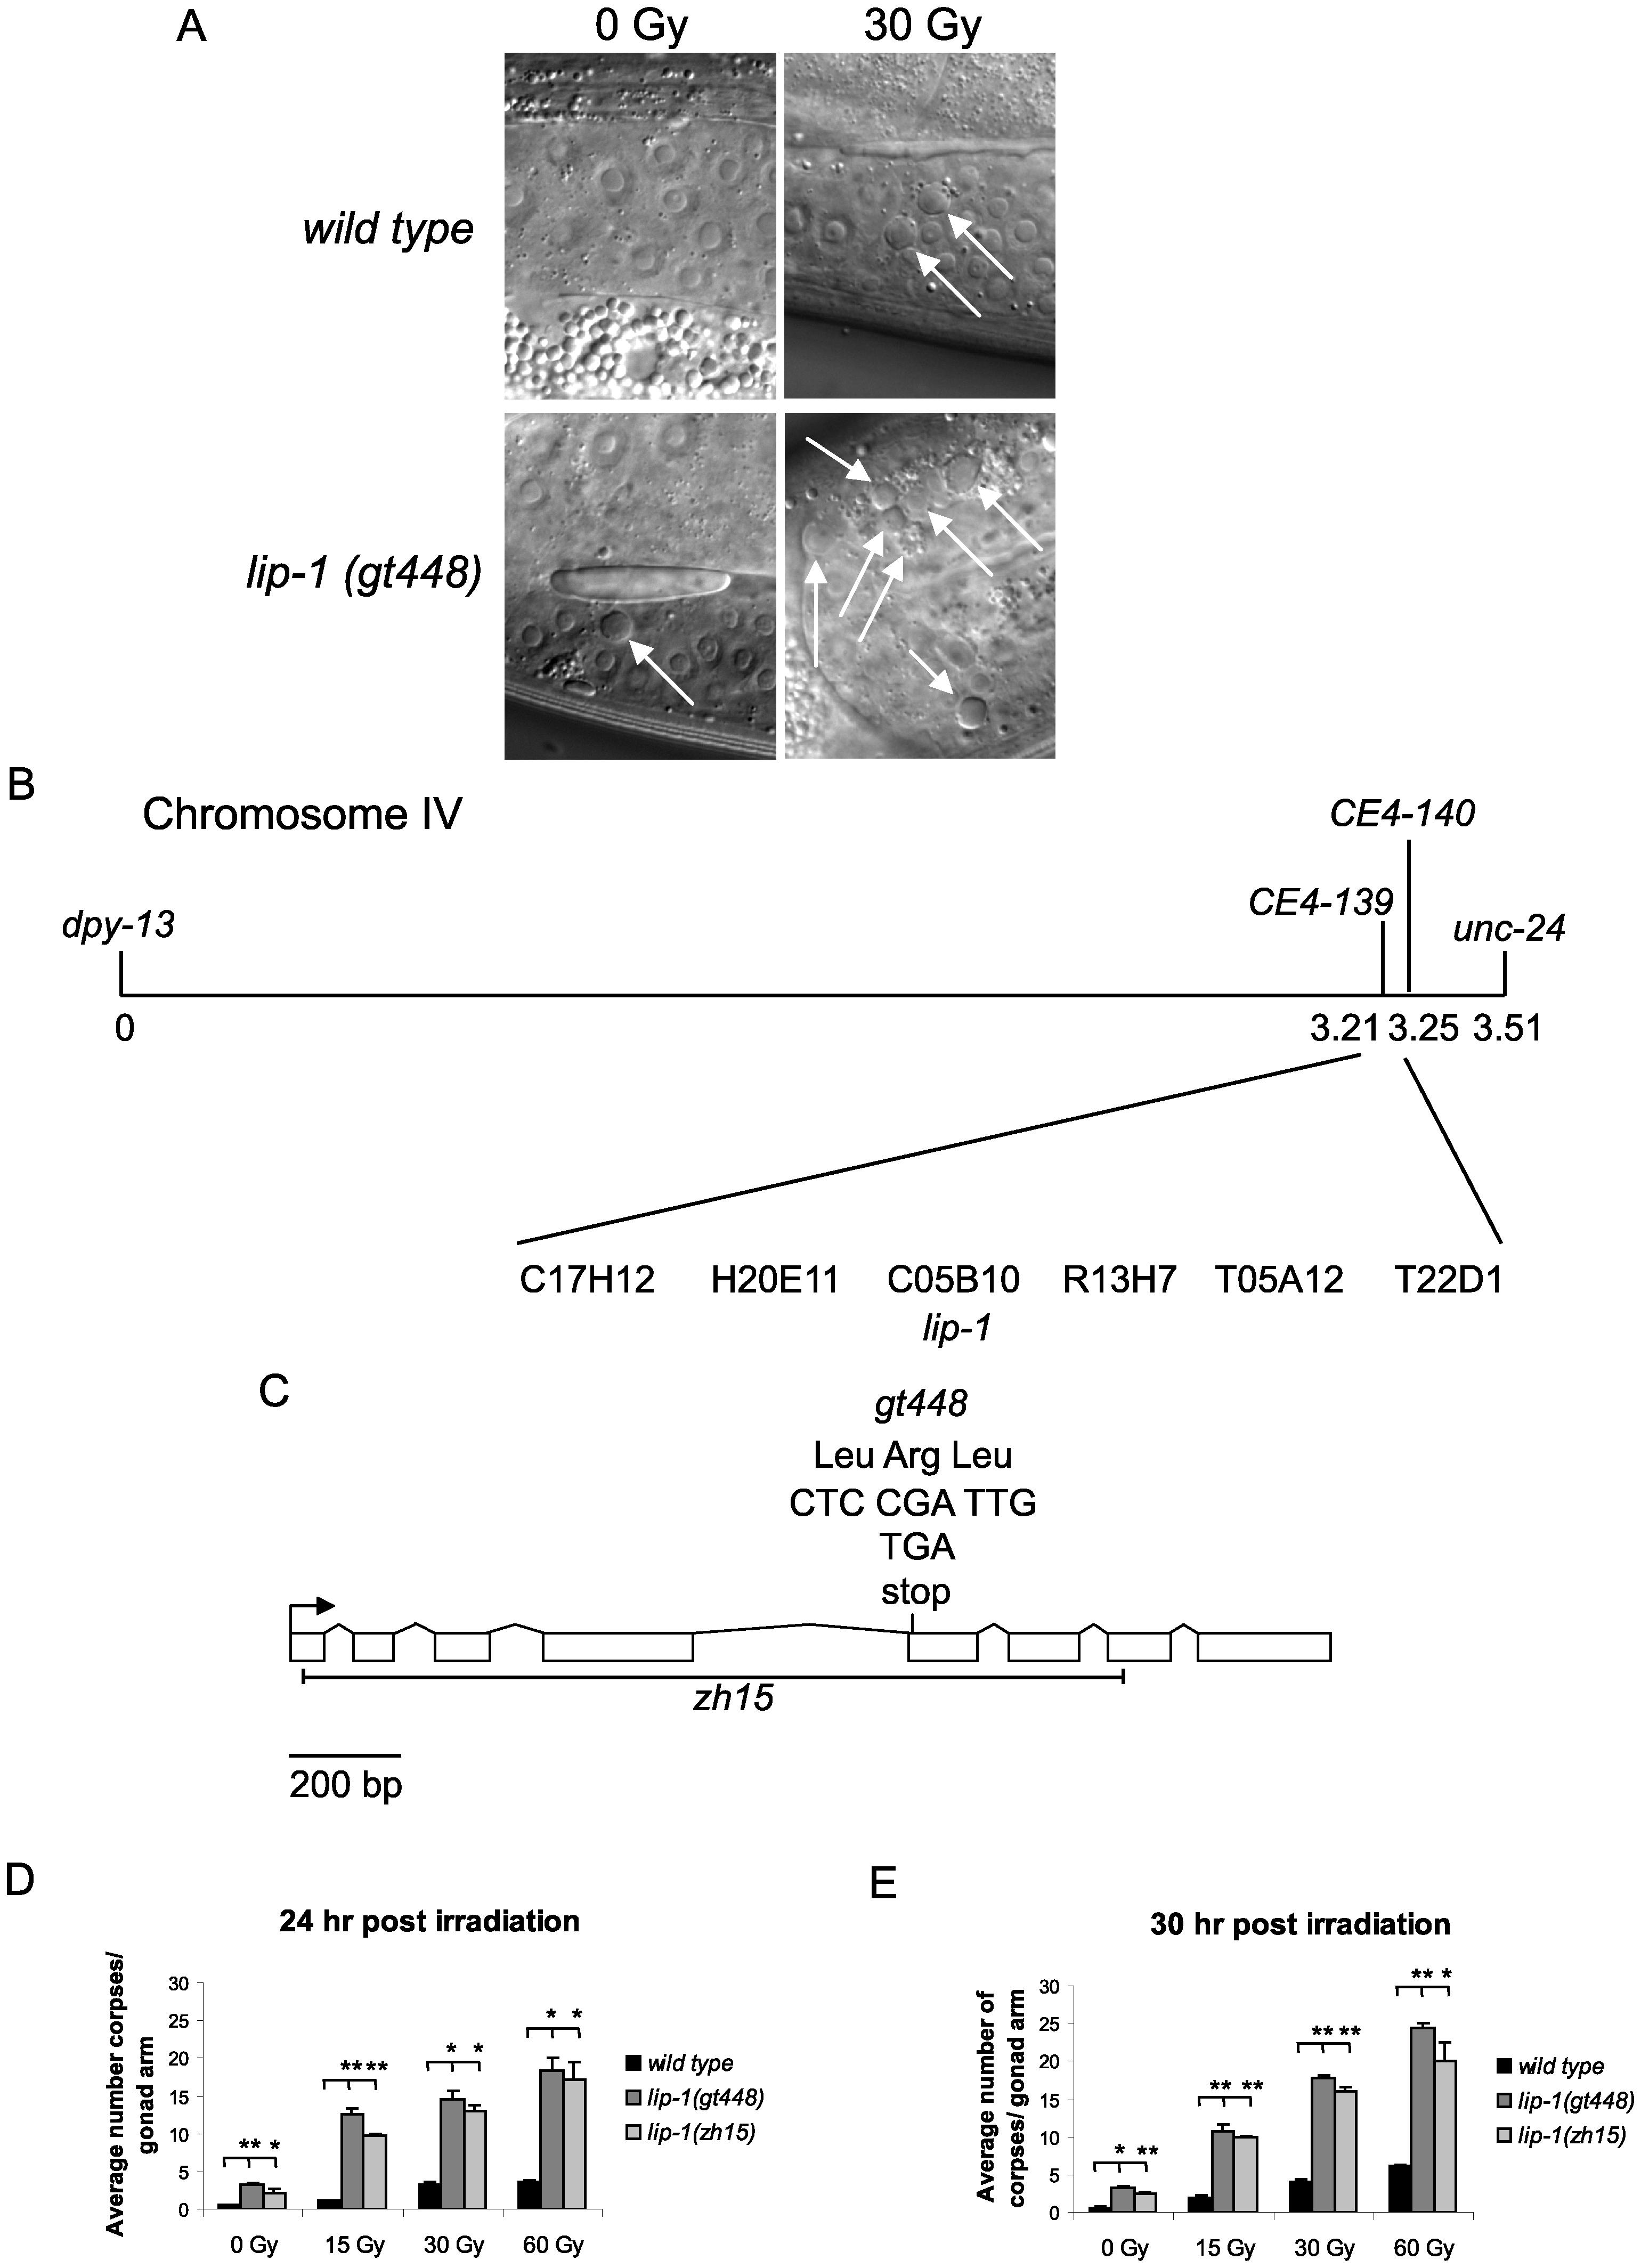 <i>gt448</i> is an allele of <i>lip-1</i>.